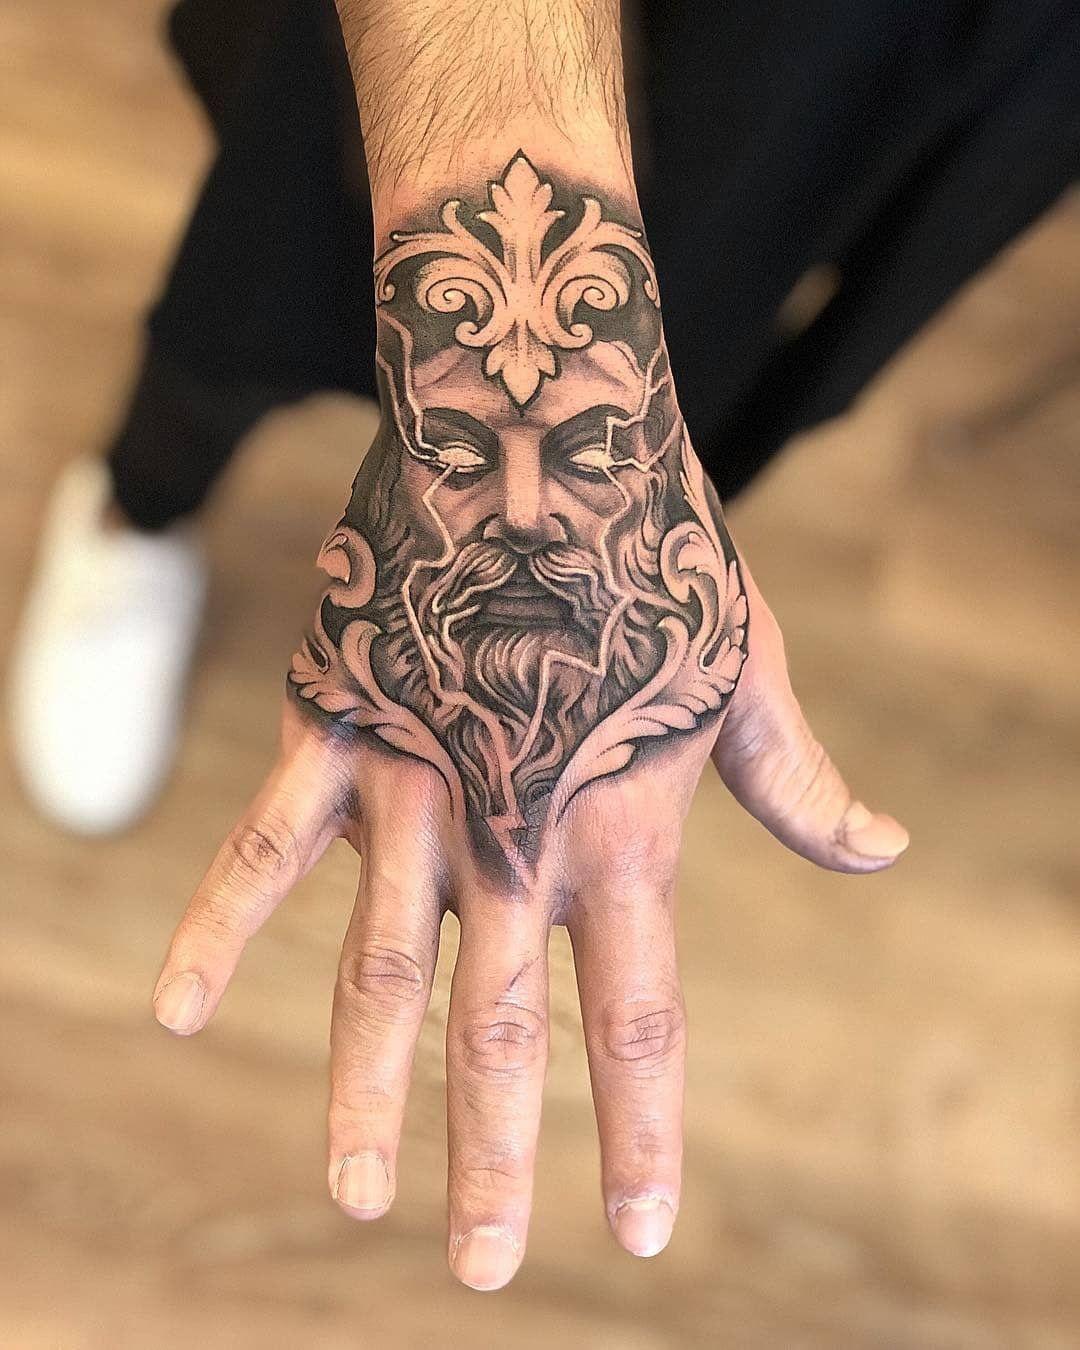 Zeus tattoo on hand